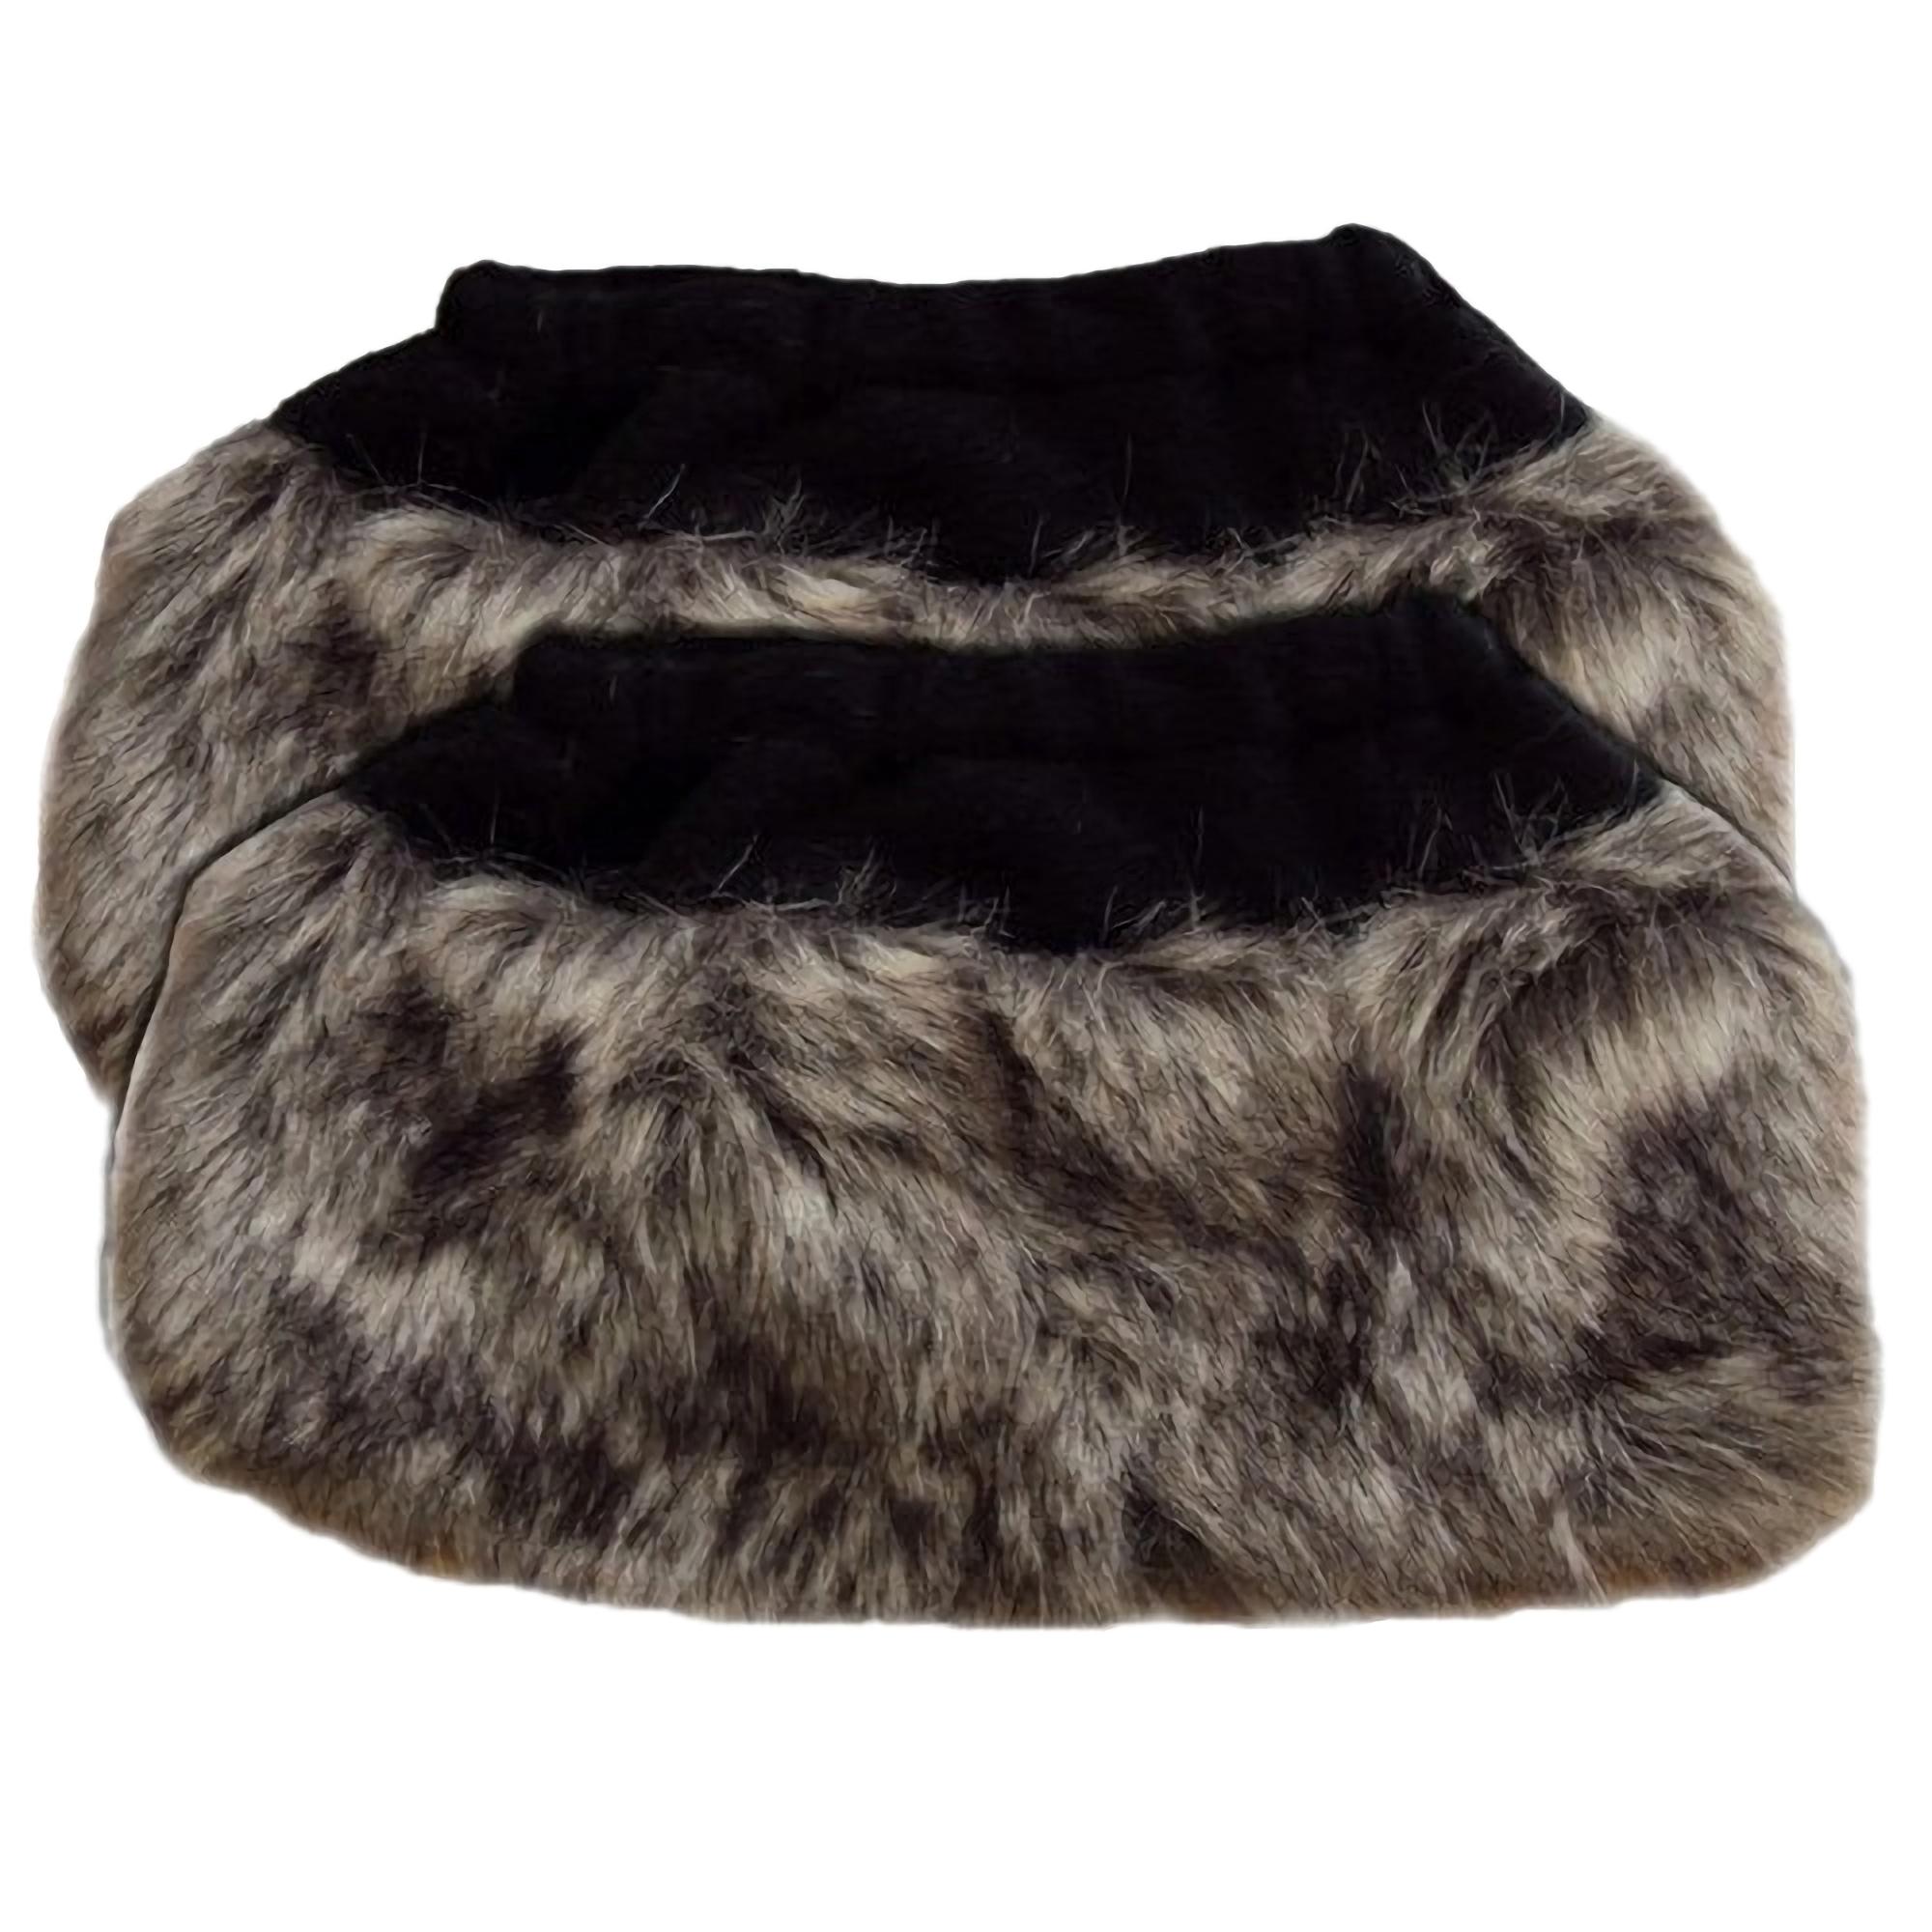 Faux Fur Cuffs: Womens/Ladies Faux Fur Animal Boot Toppers/Cuffs Leg